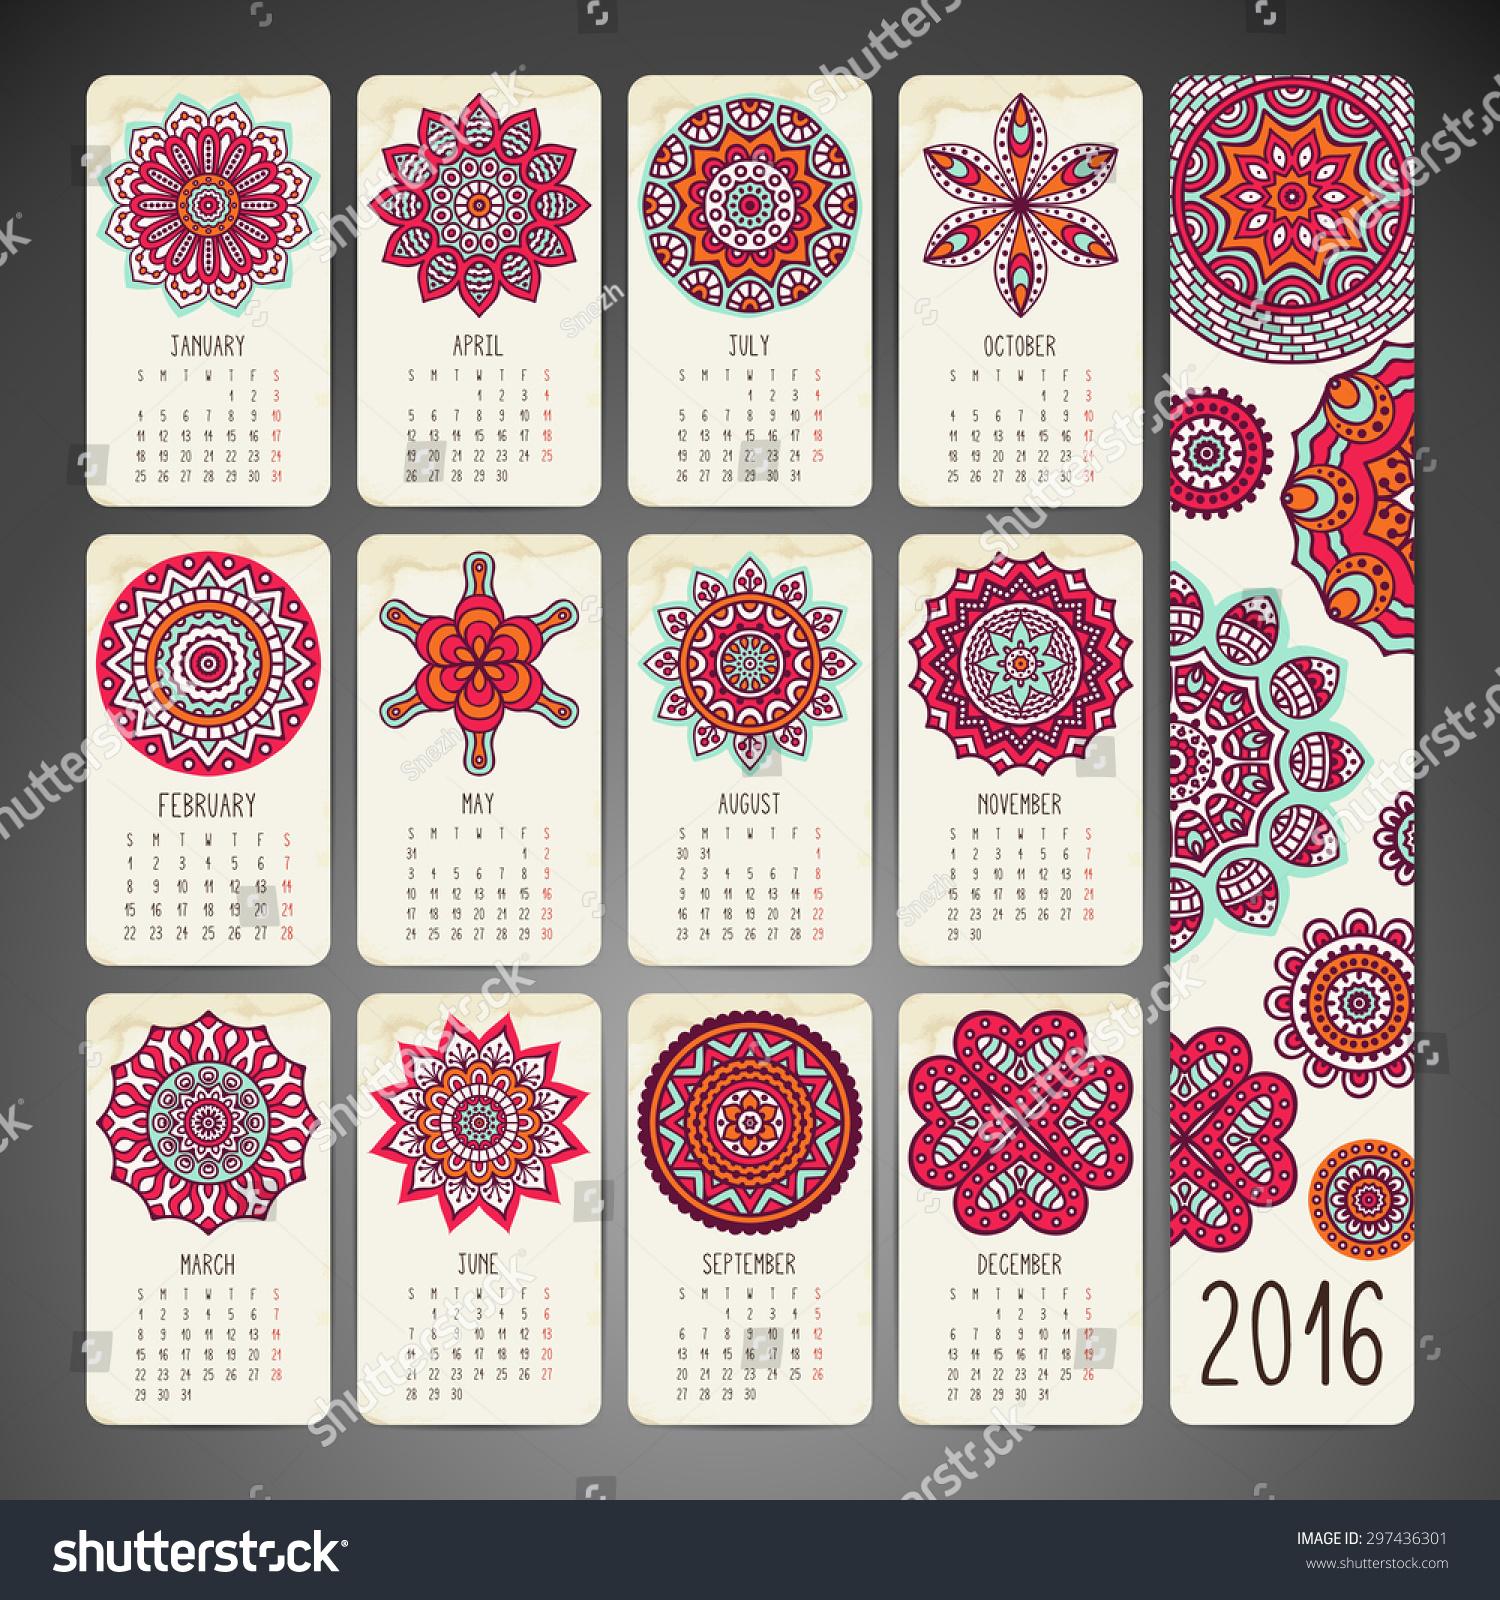 Calendar Vintage Vector : Calendar vintage decorative elements oriental stock